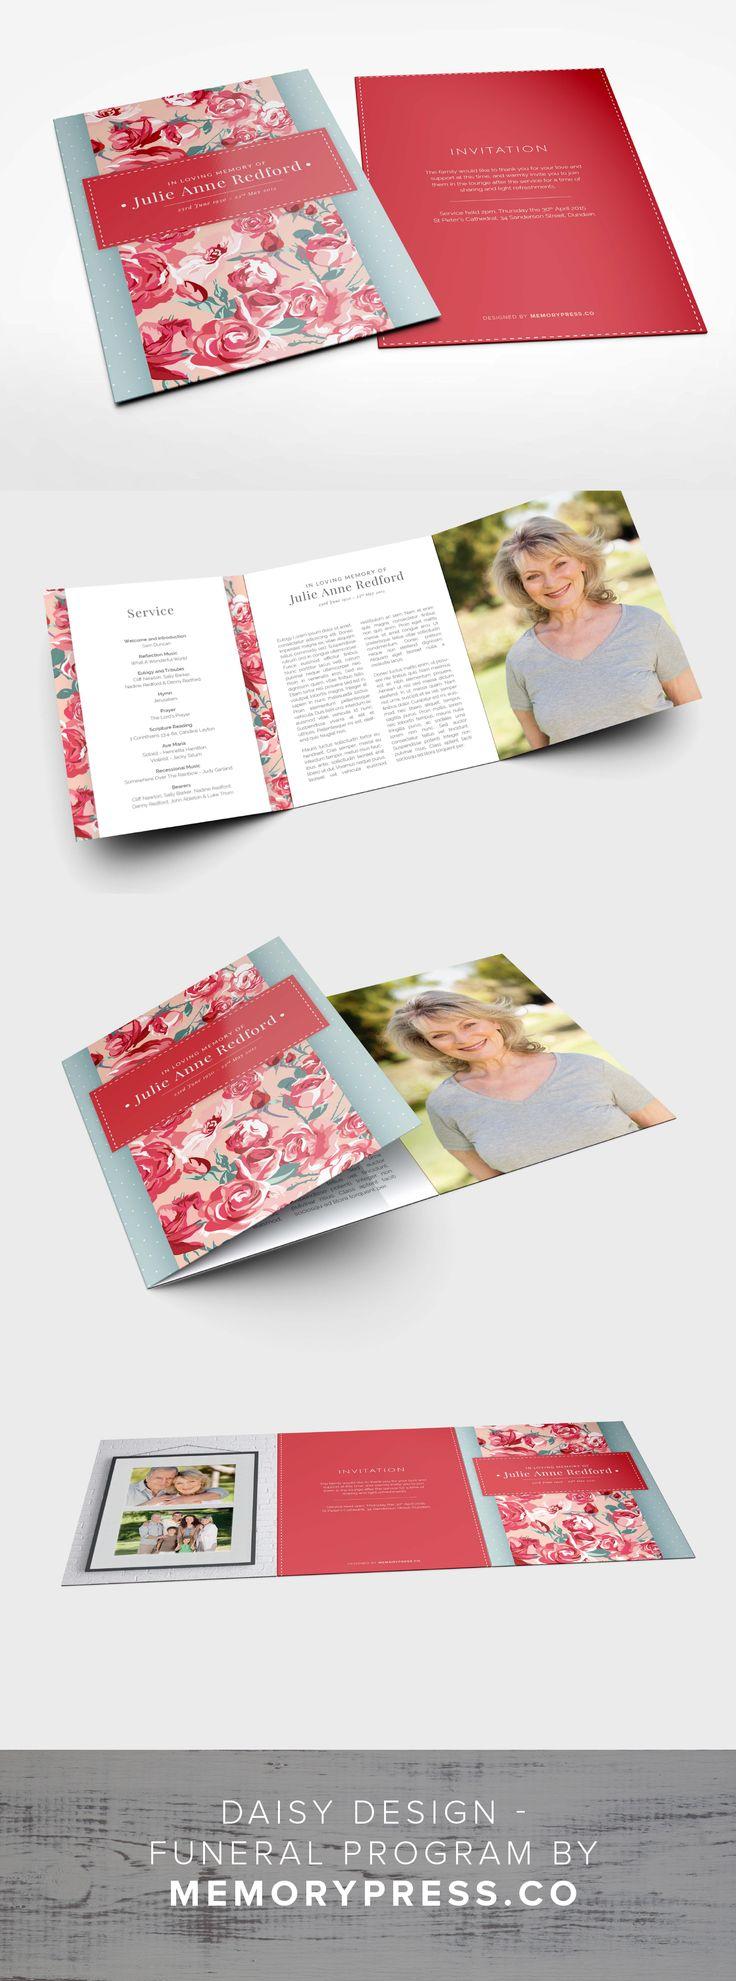 free funeral brochure templates online etxauzia org